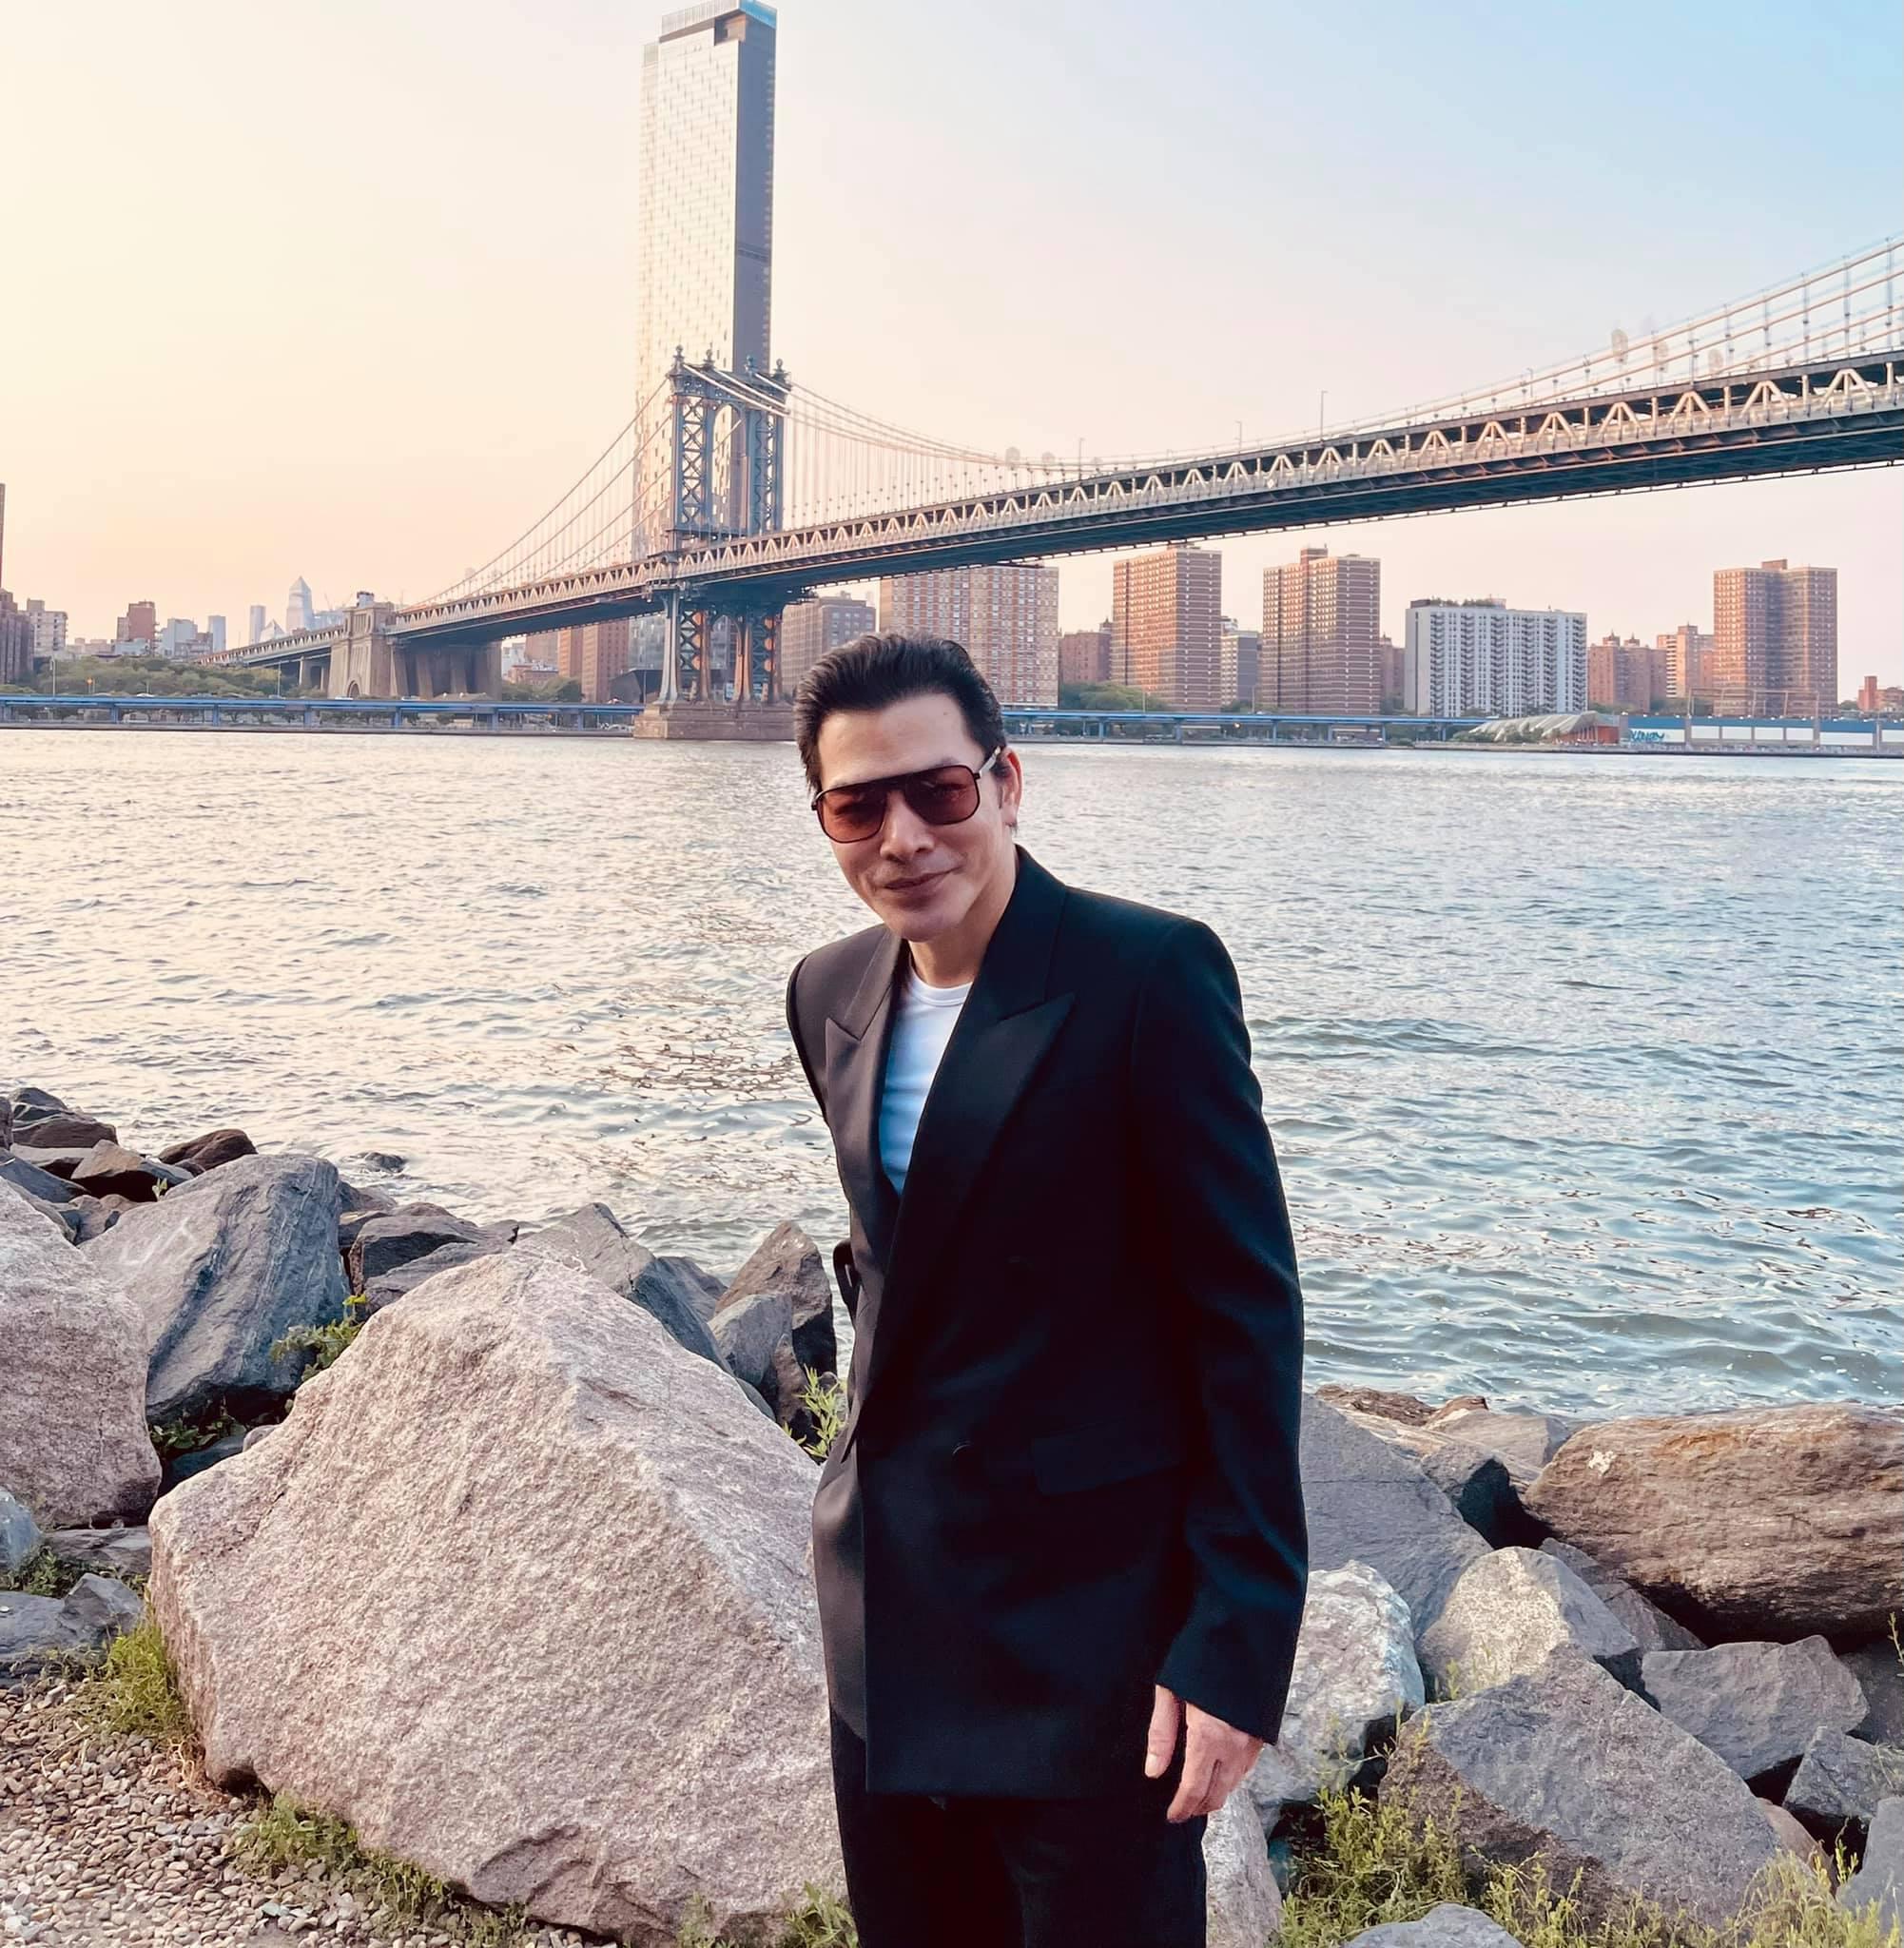 Hai bố con tham quan cây cầu Brooklyn nổi tiếng.